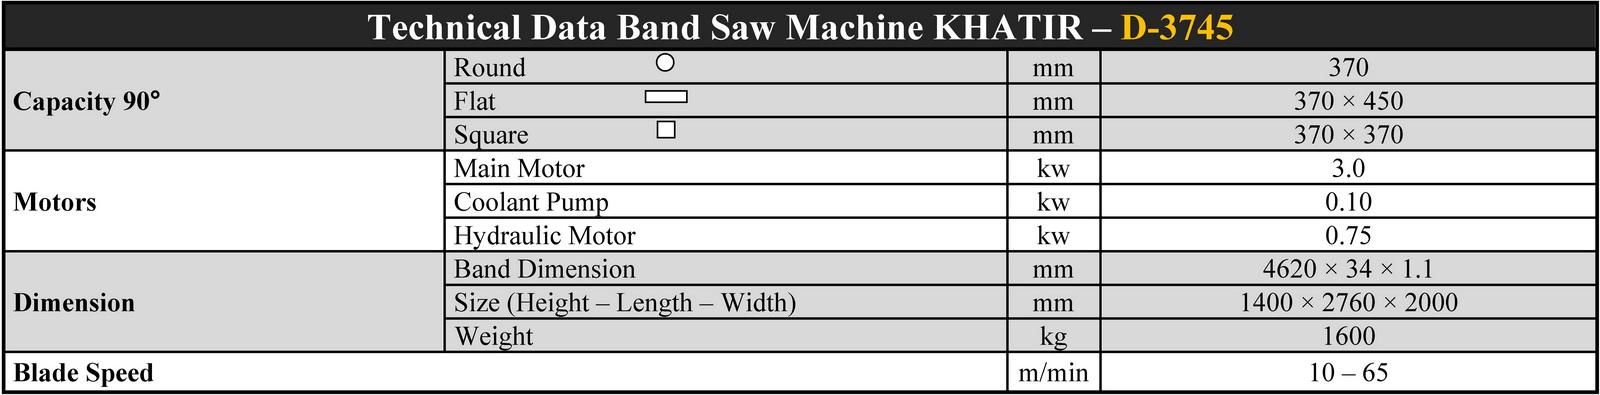 D-3745 مشخصات فنی دستگاه اره نواری دوستونه نیمه اتوماتیک خطیر ماشین